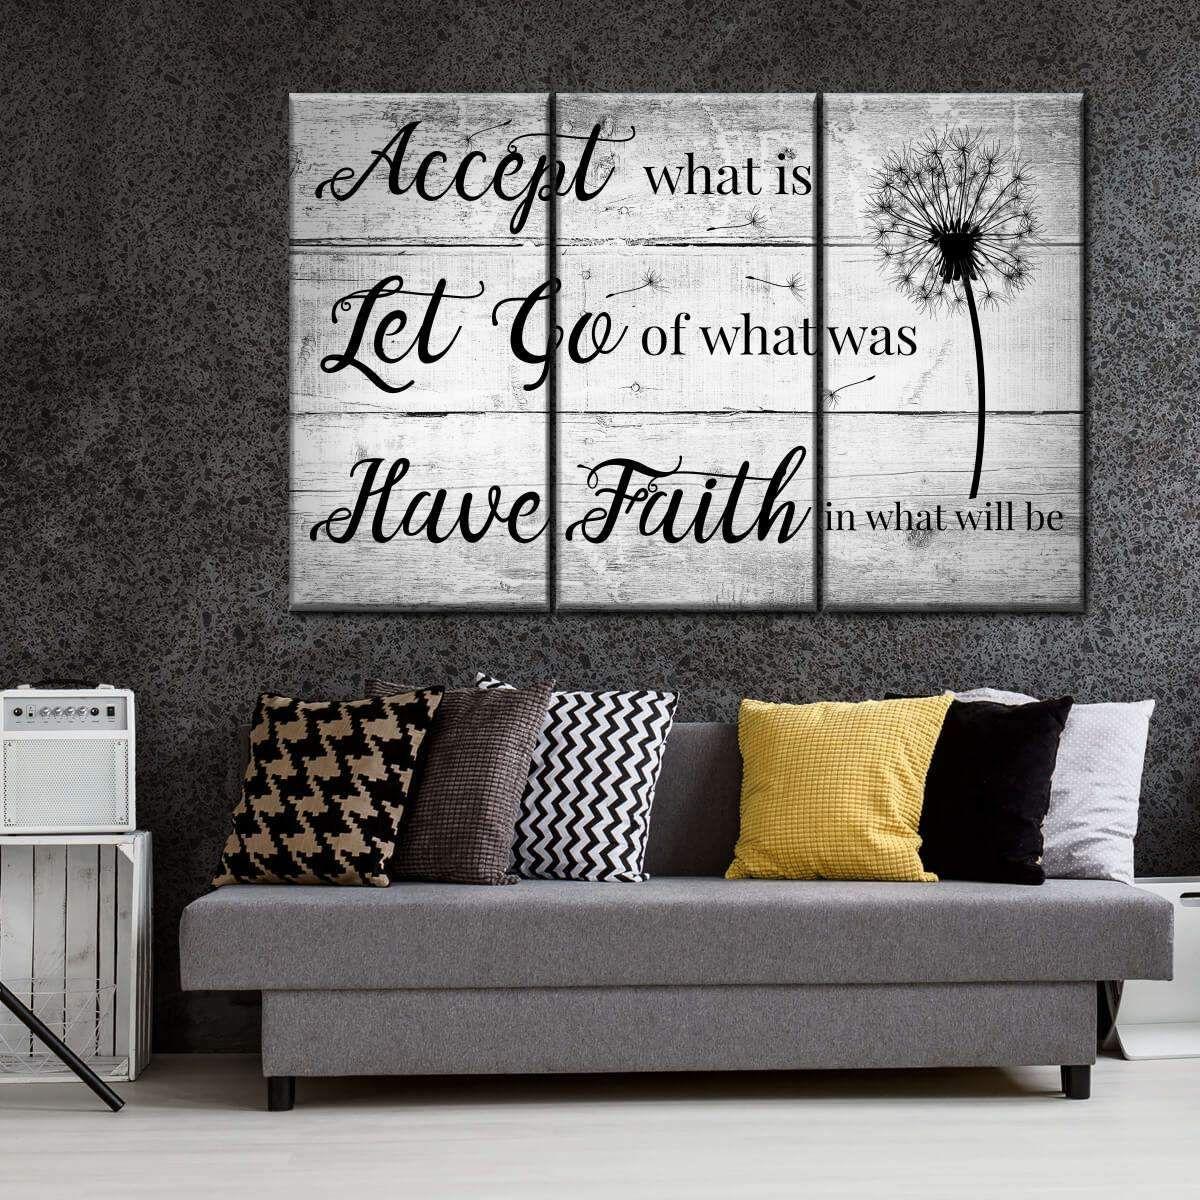 Have Faith Multi Panel Canvas Wall Art Family Wall Decor Room Wall Art Decor